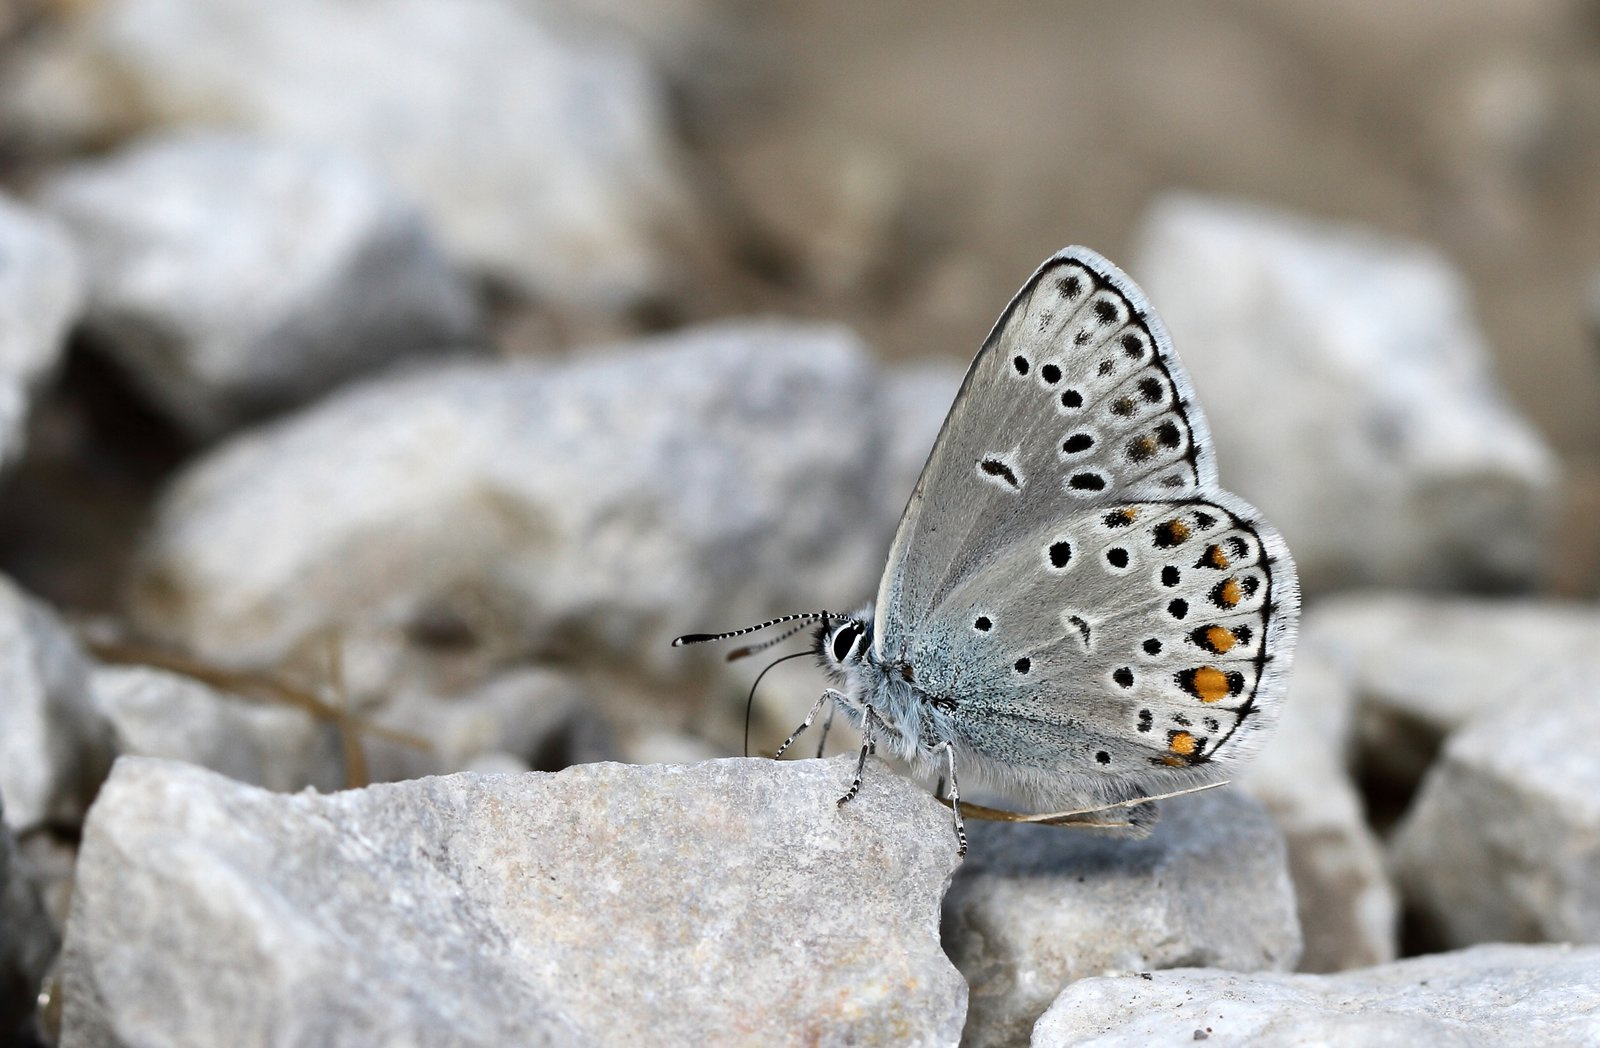 Safirblåfugl, Kretania sephirus